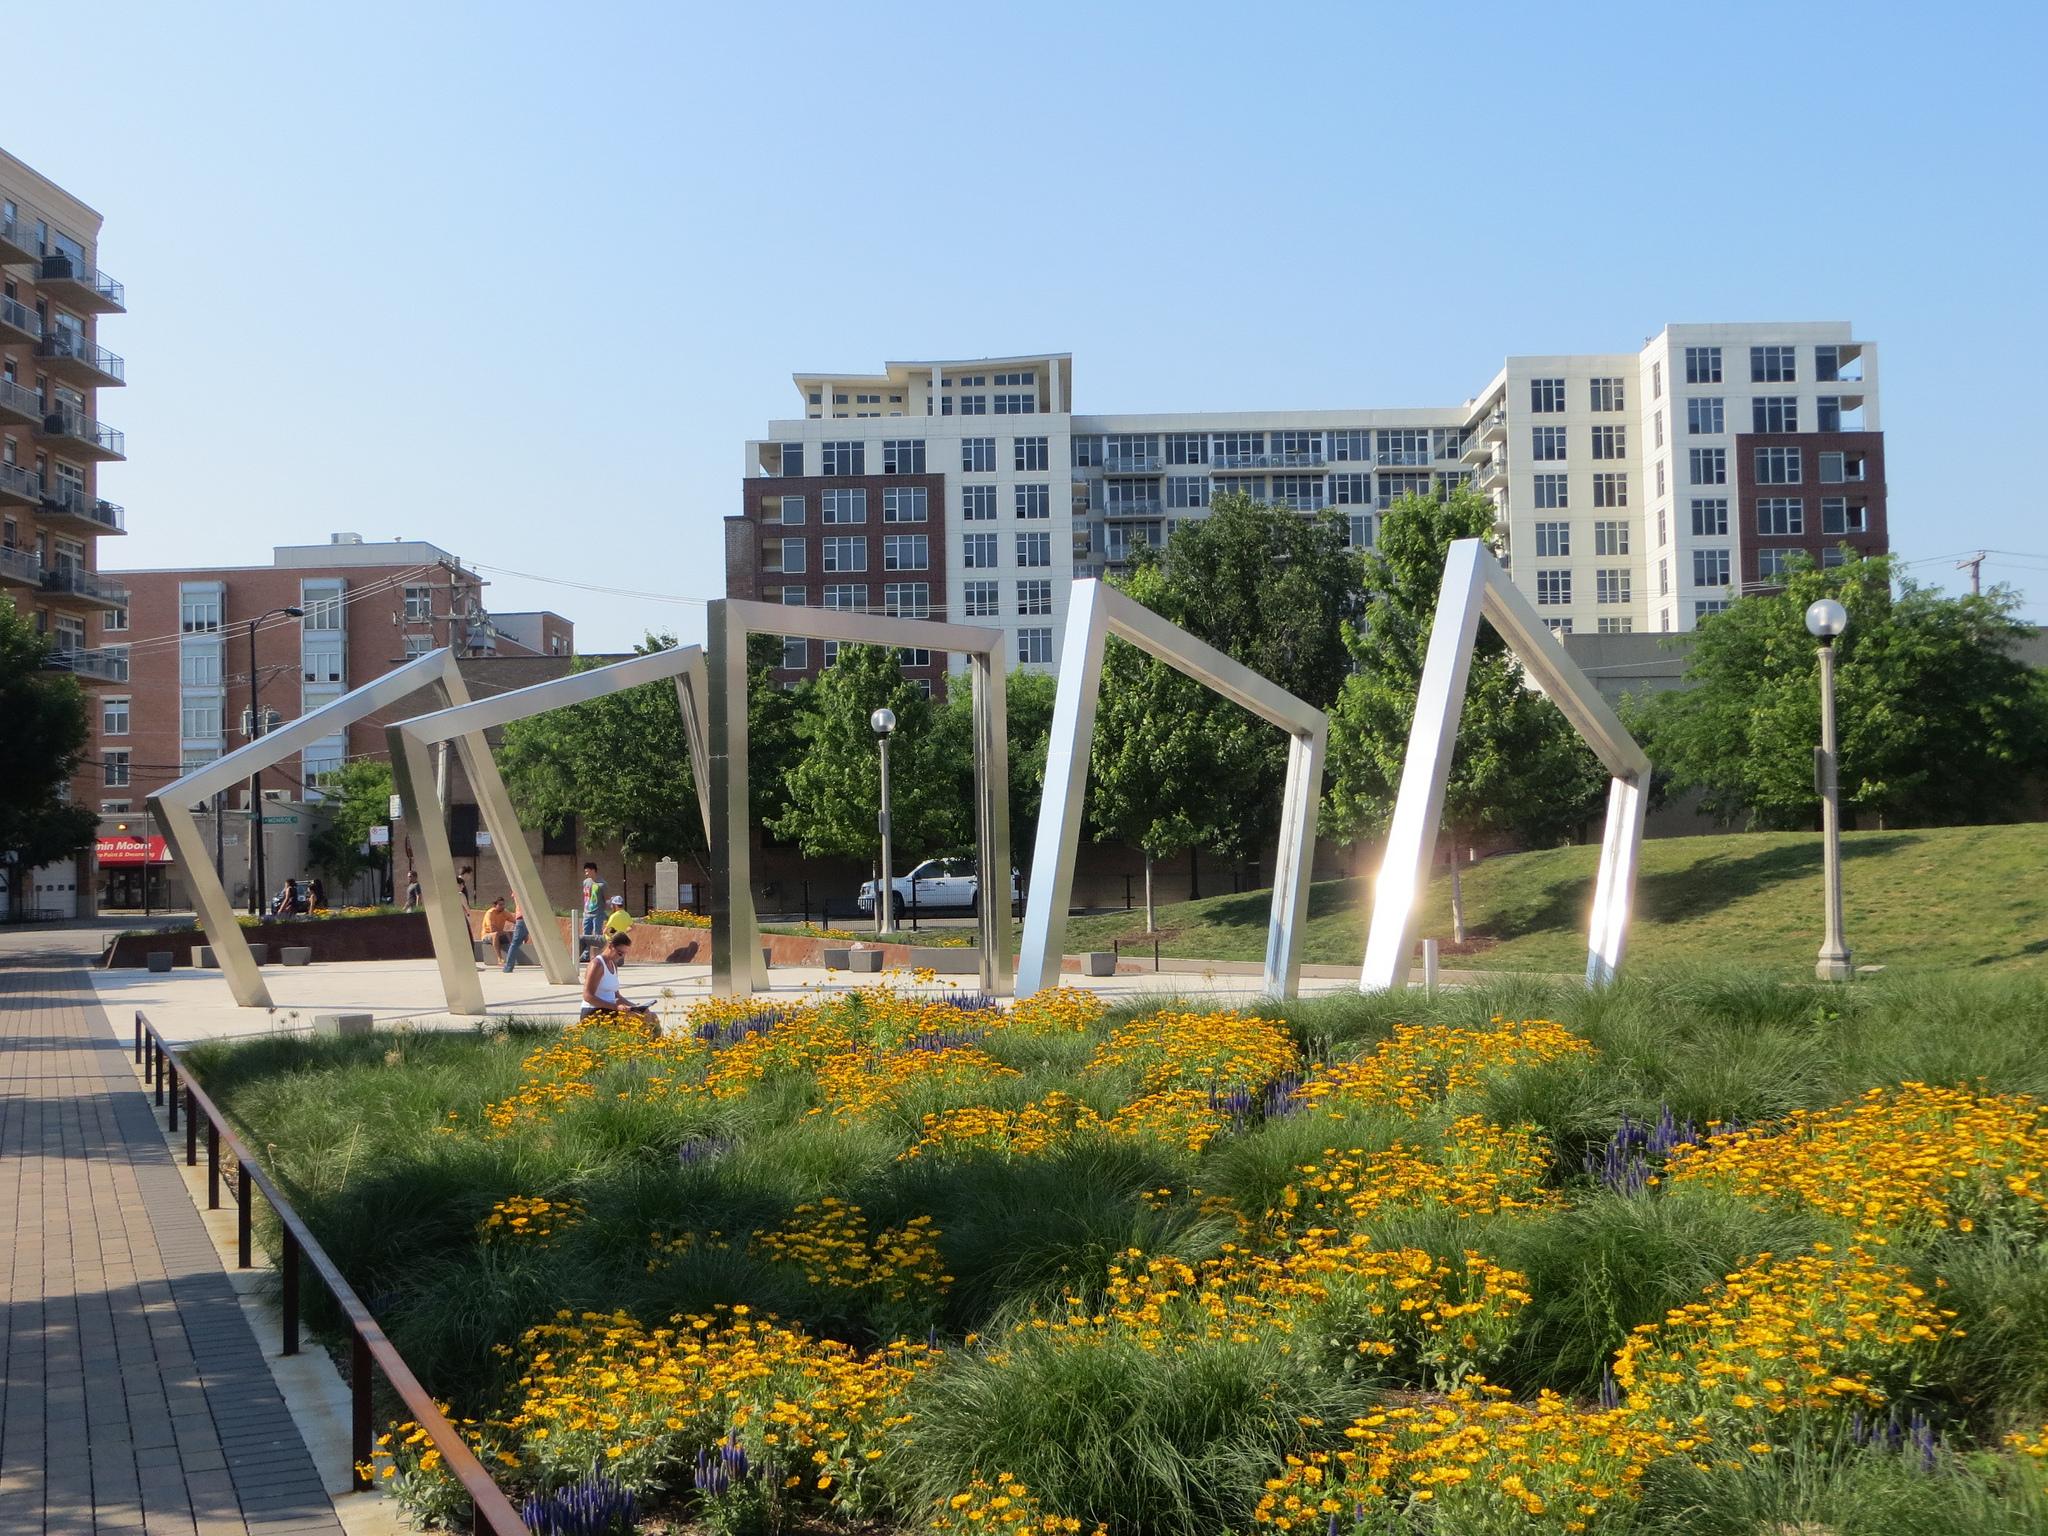 Retangular, frame-shaped public art in Chicago's Mary Bartelme Park on a sunny day.